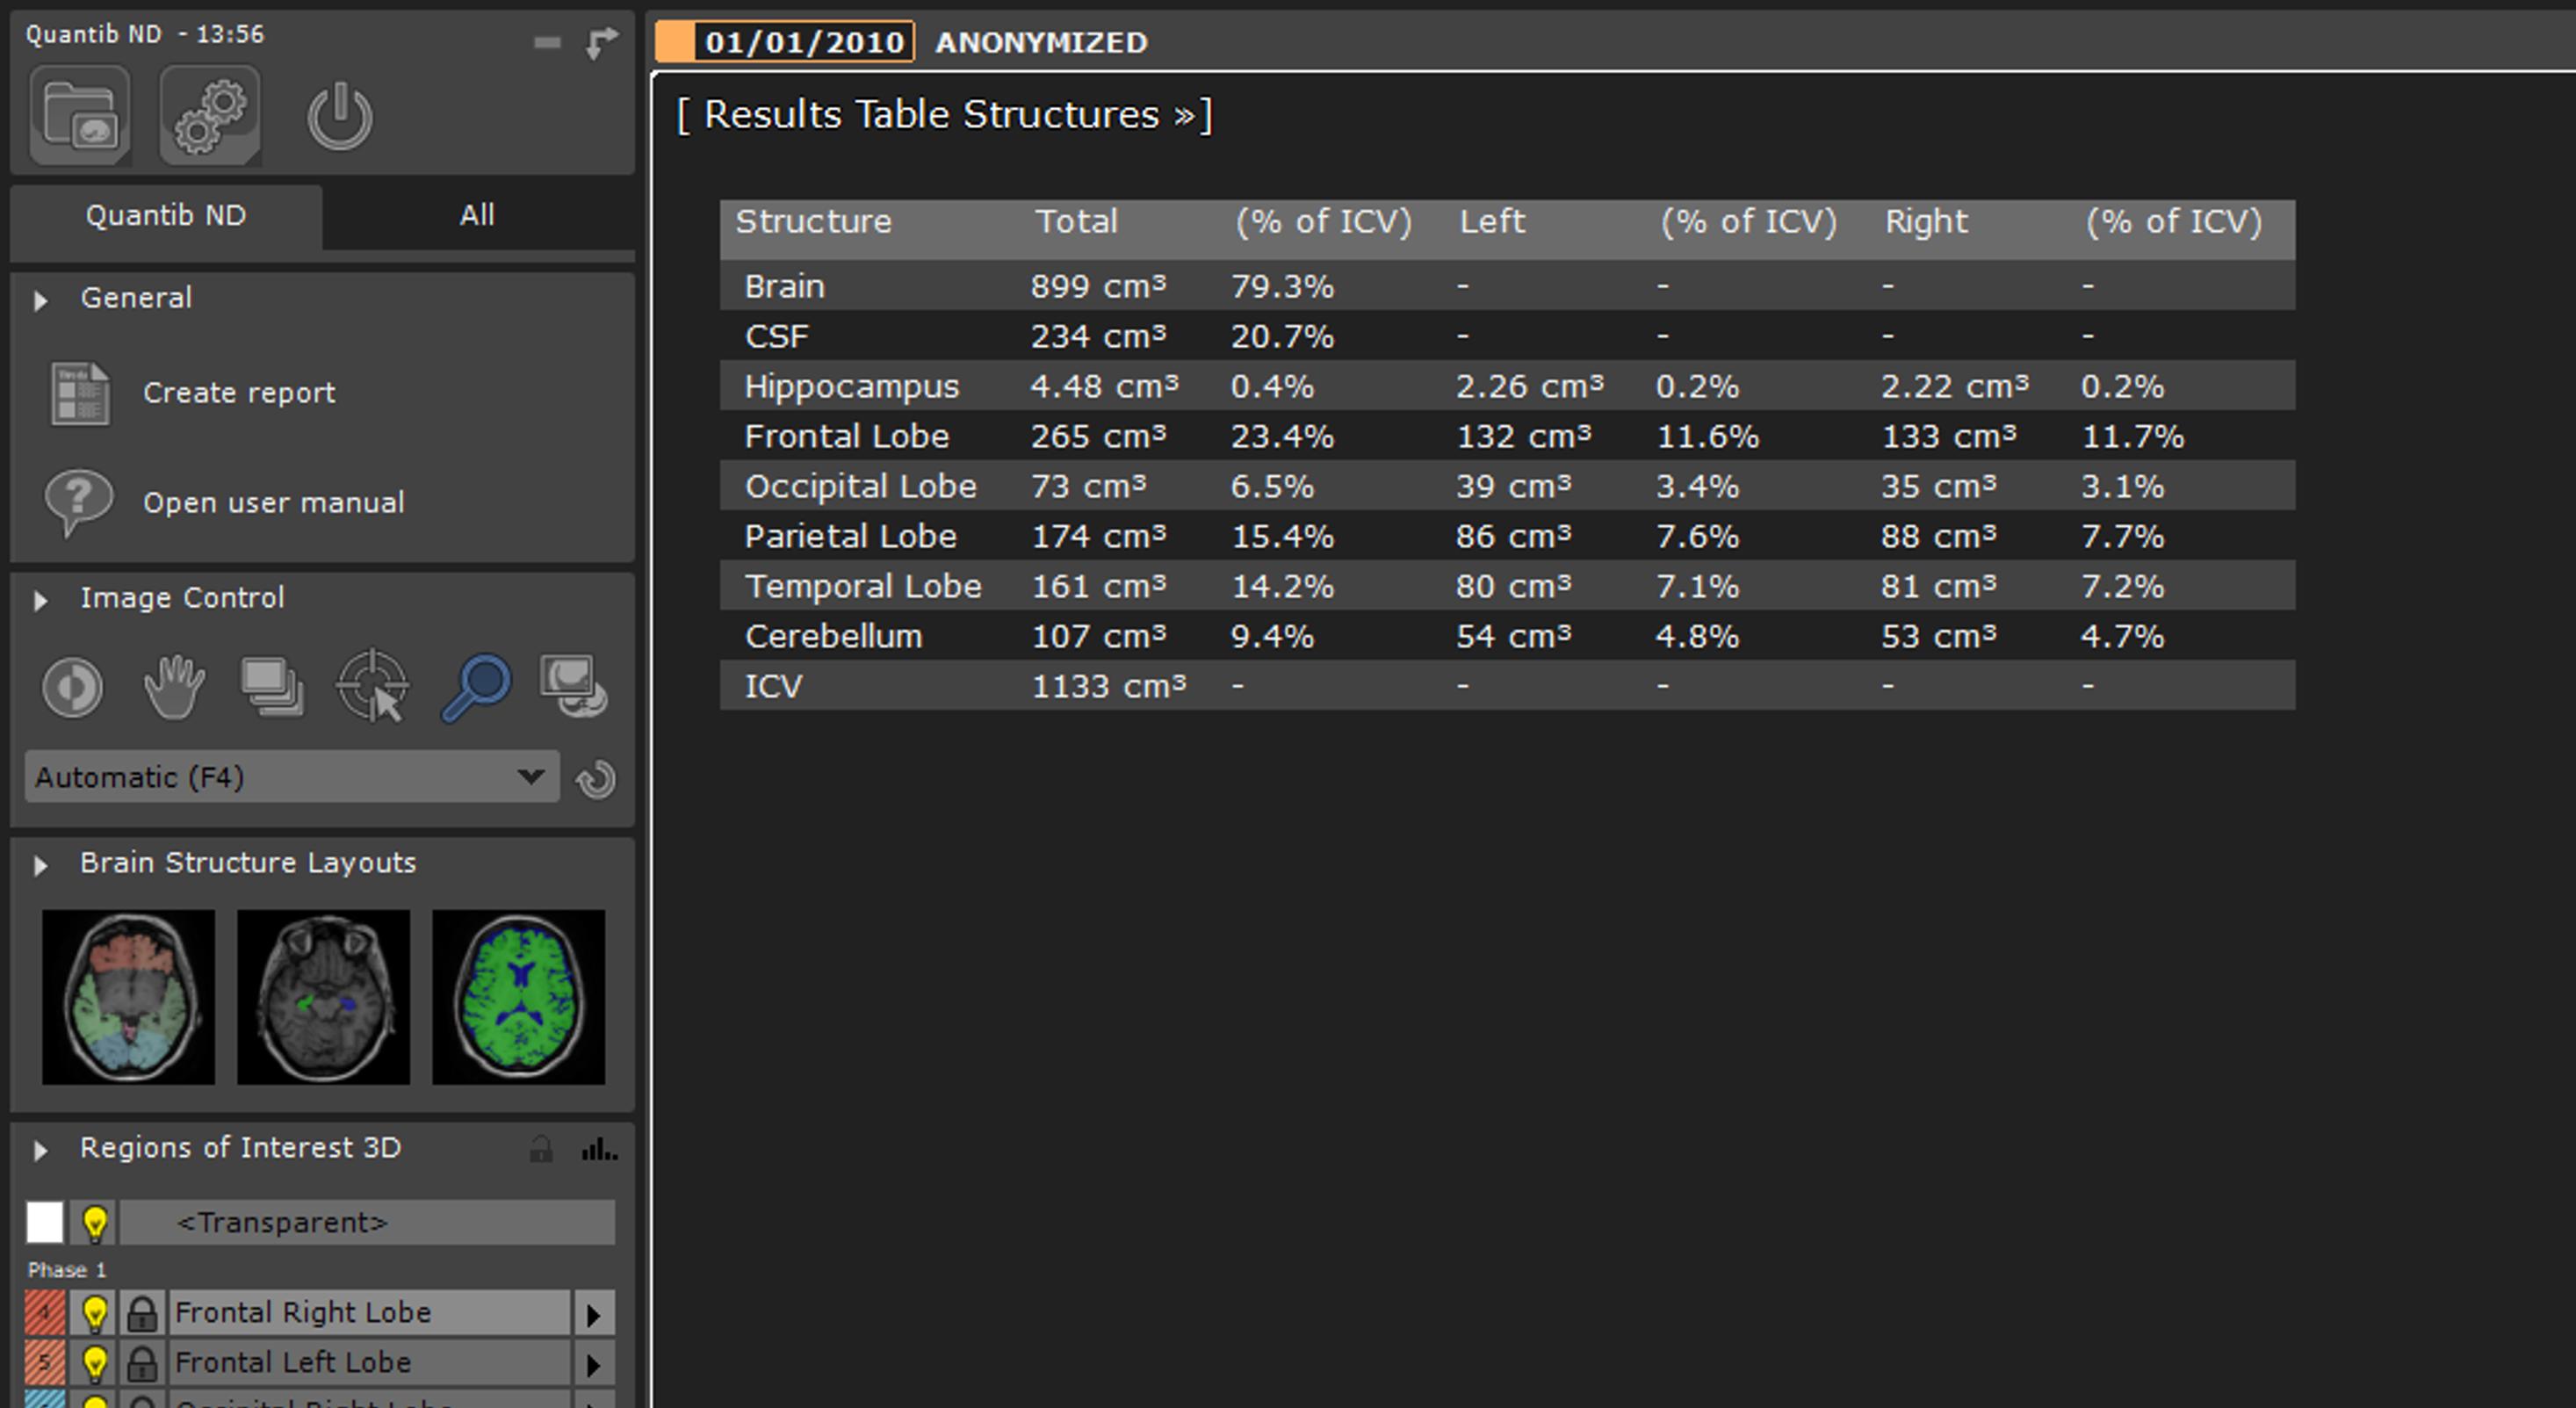 Quantib ND Results Table